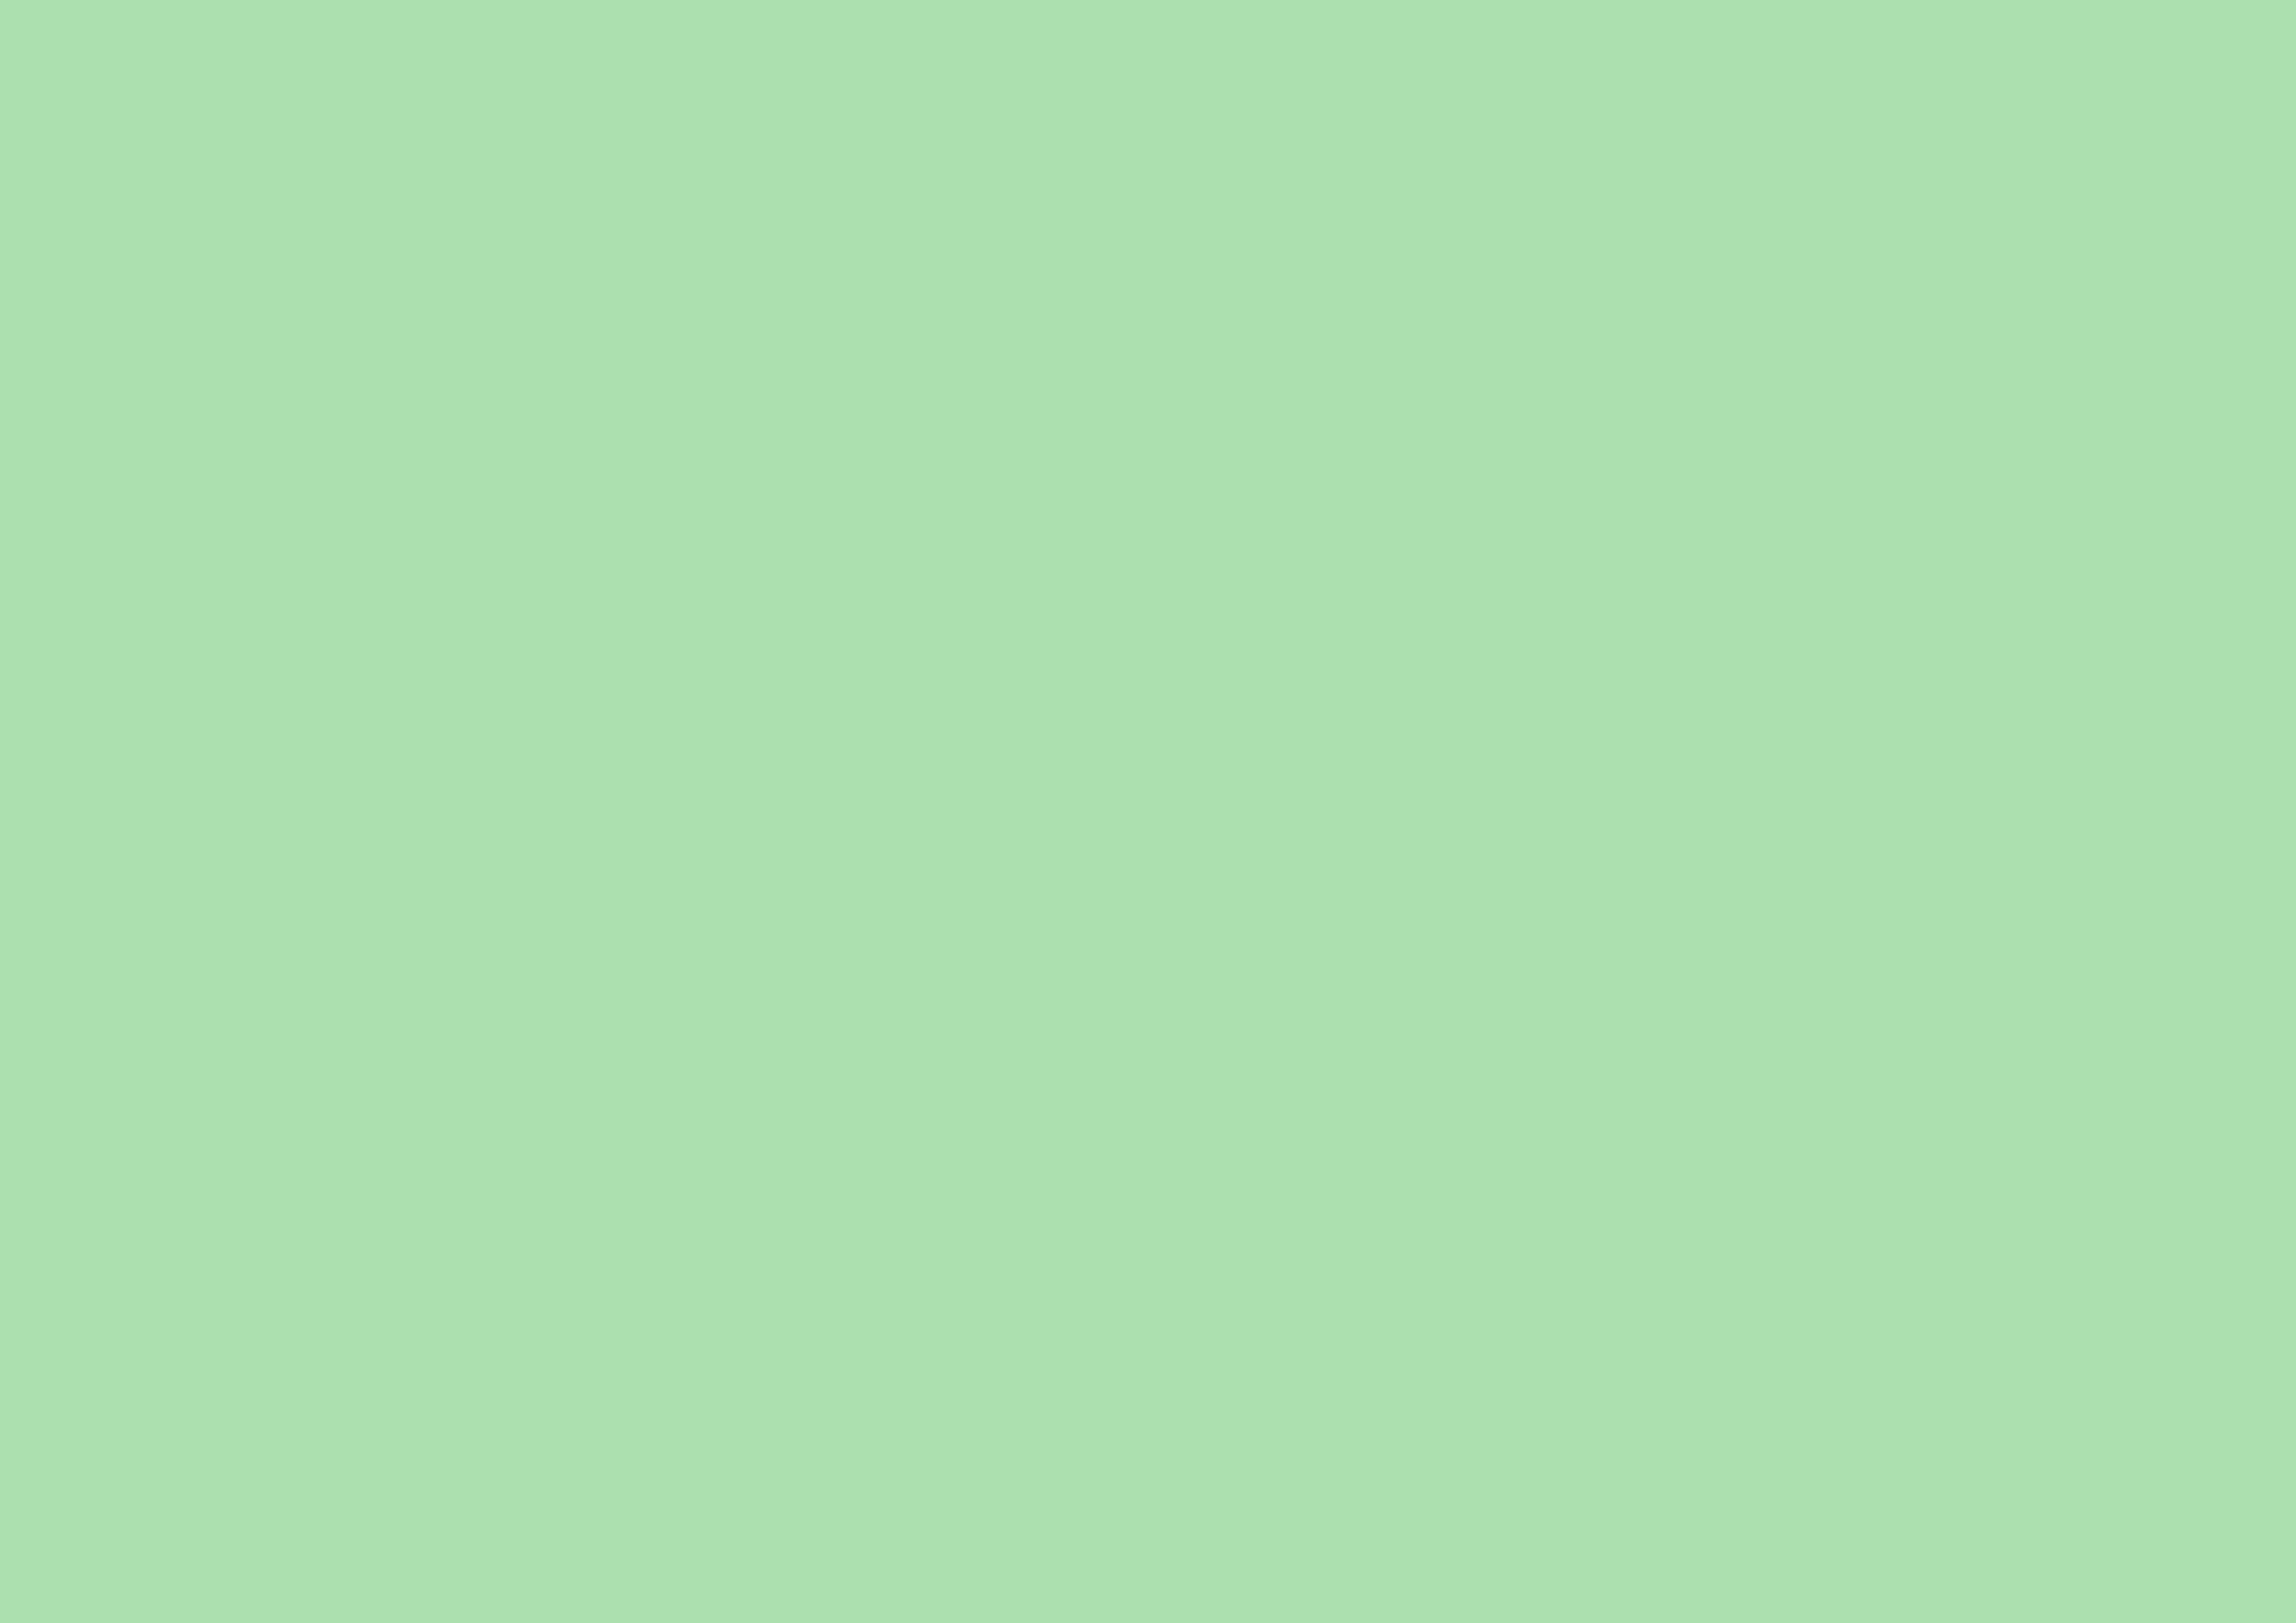 3508x2480 Celadon Solid Color Background